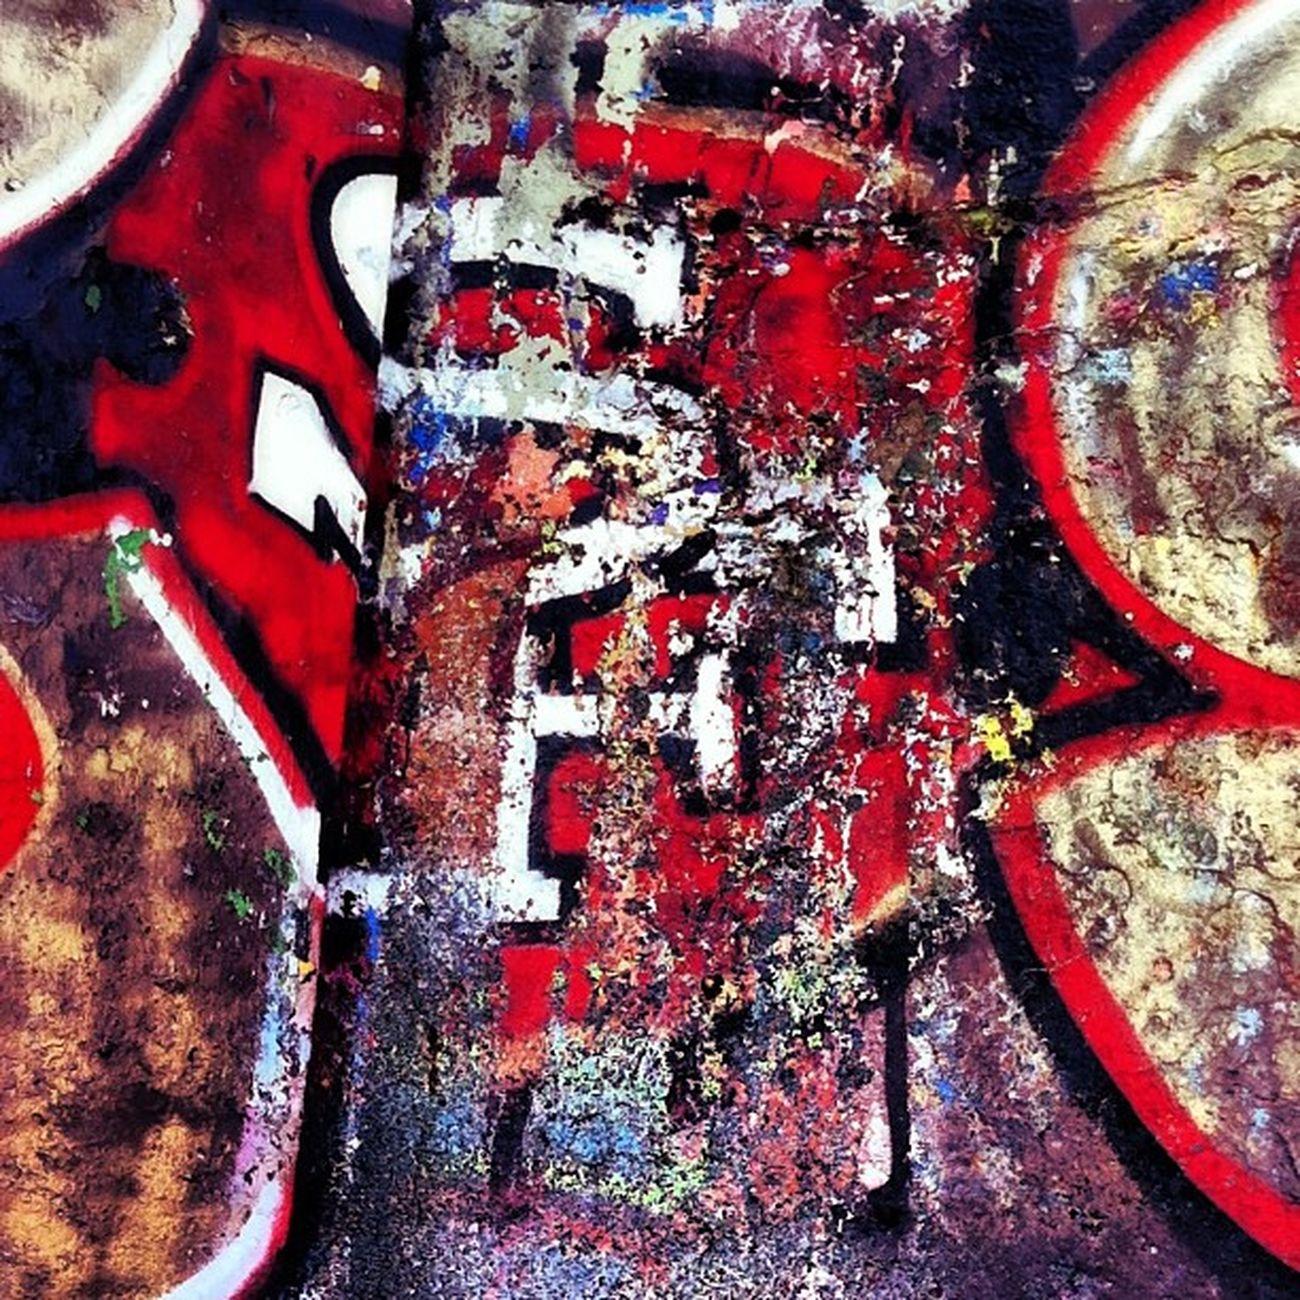 NINERS Graffiti TheCity Bayarea Bolinas beach beachart 49ers sanfrancisco redandgold superbowl 2013